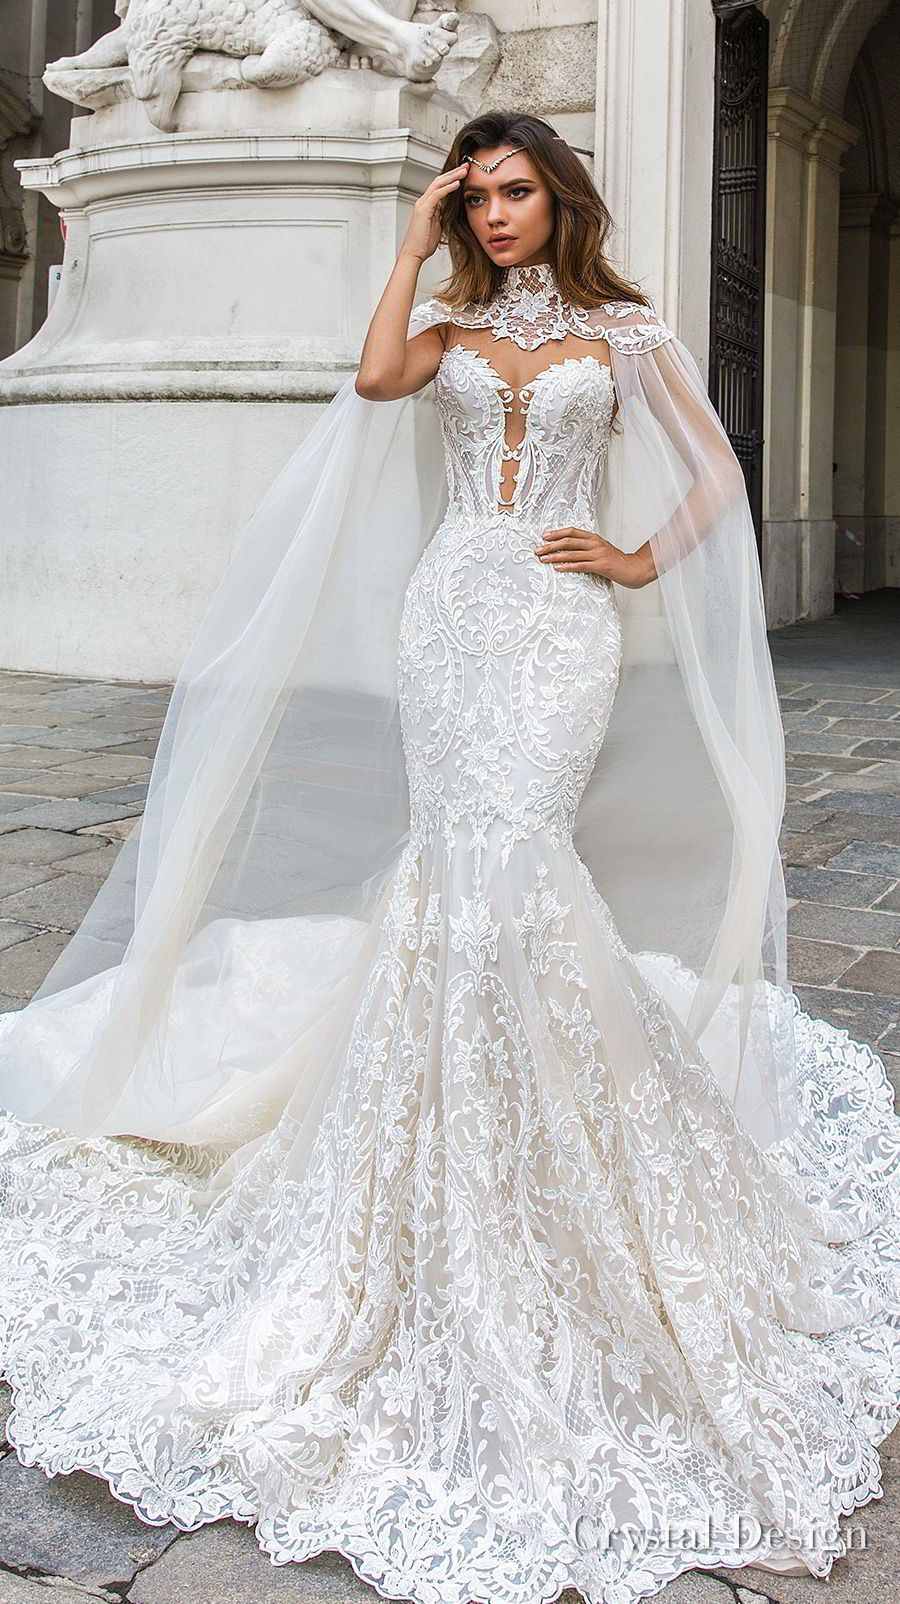 Crystal Design 2018 Sleeveless Strapless Deep Plunging Sweetheart Neckline Full Embellishment Elegant Mermaid Wedding Dress Sheer On Back Chapel Train